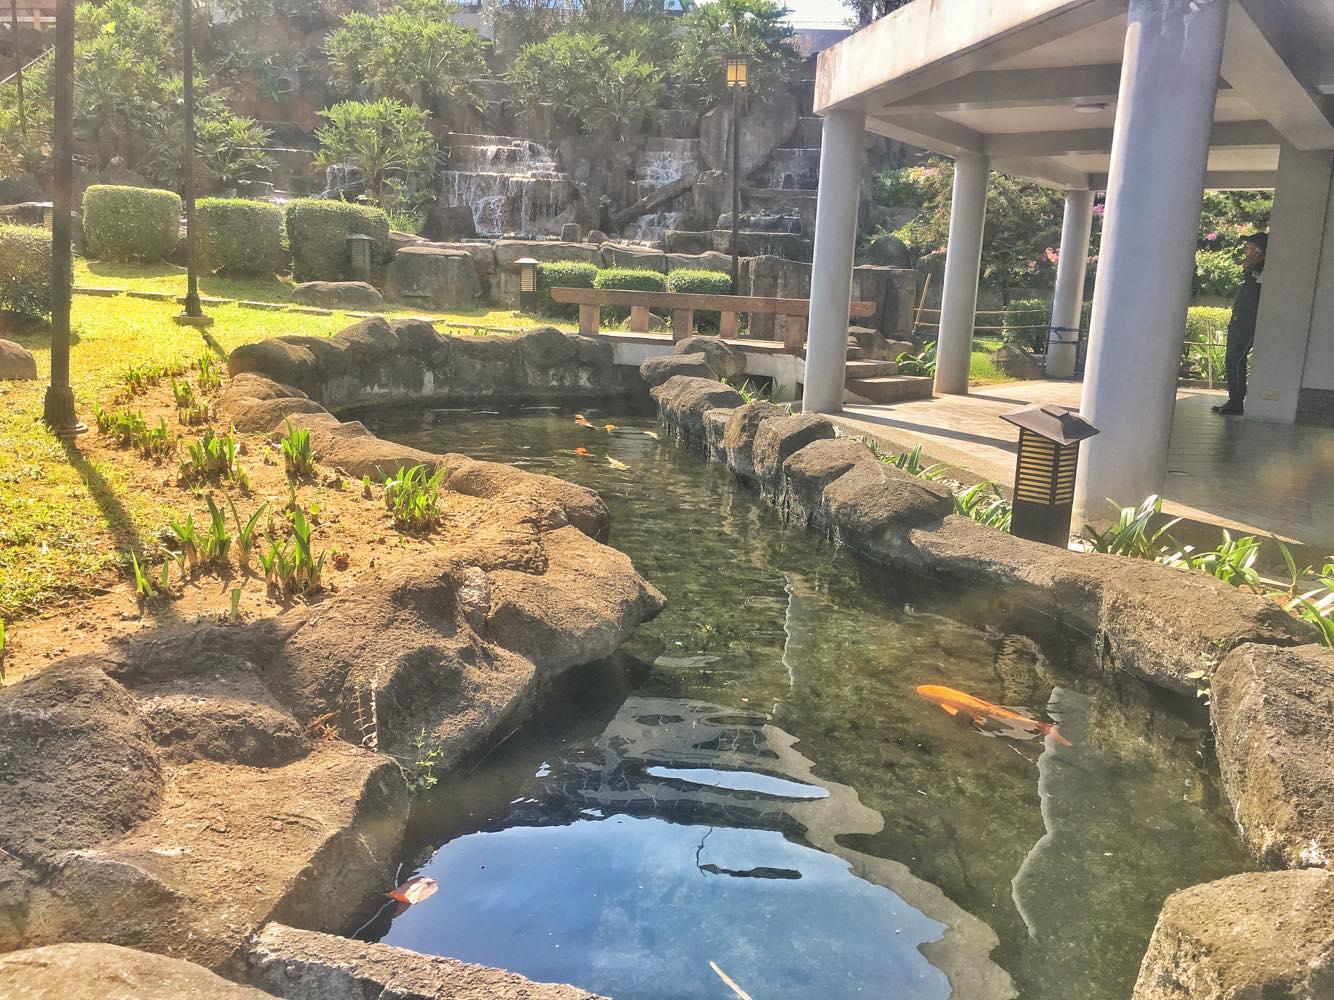 Public Park in Makati